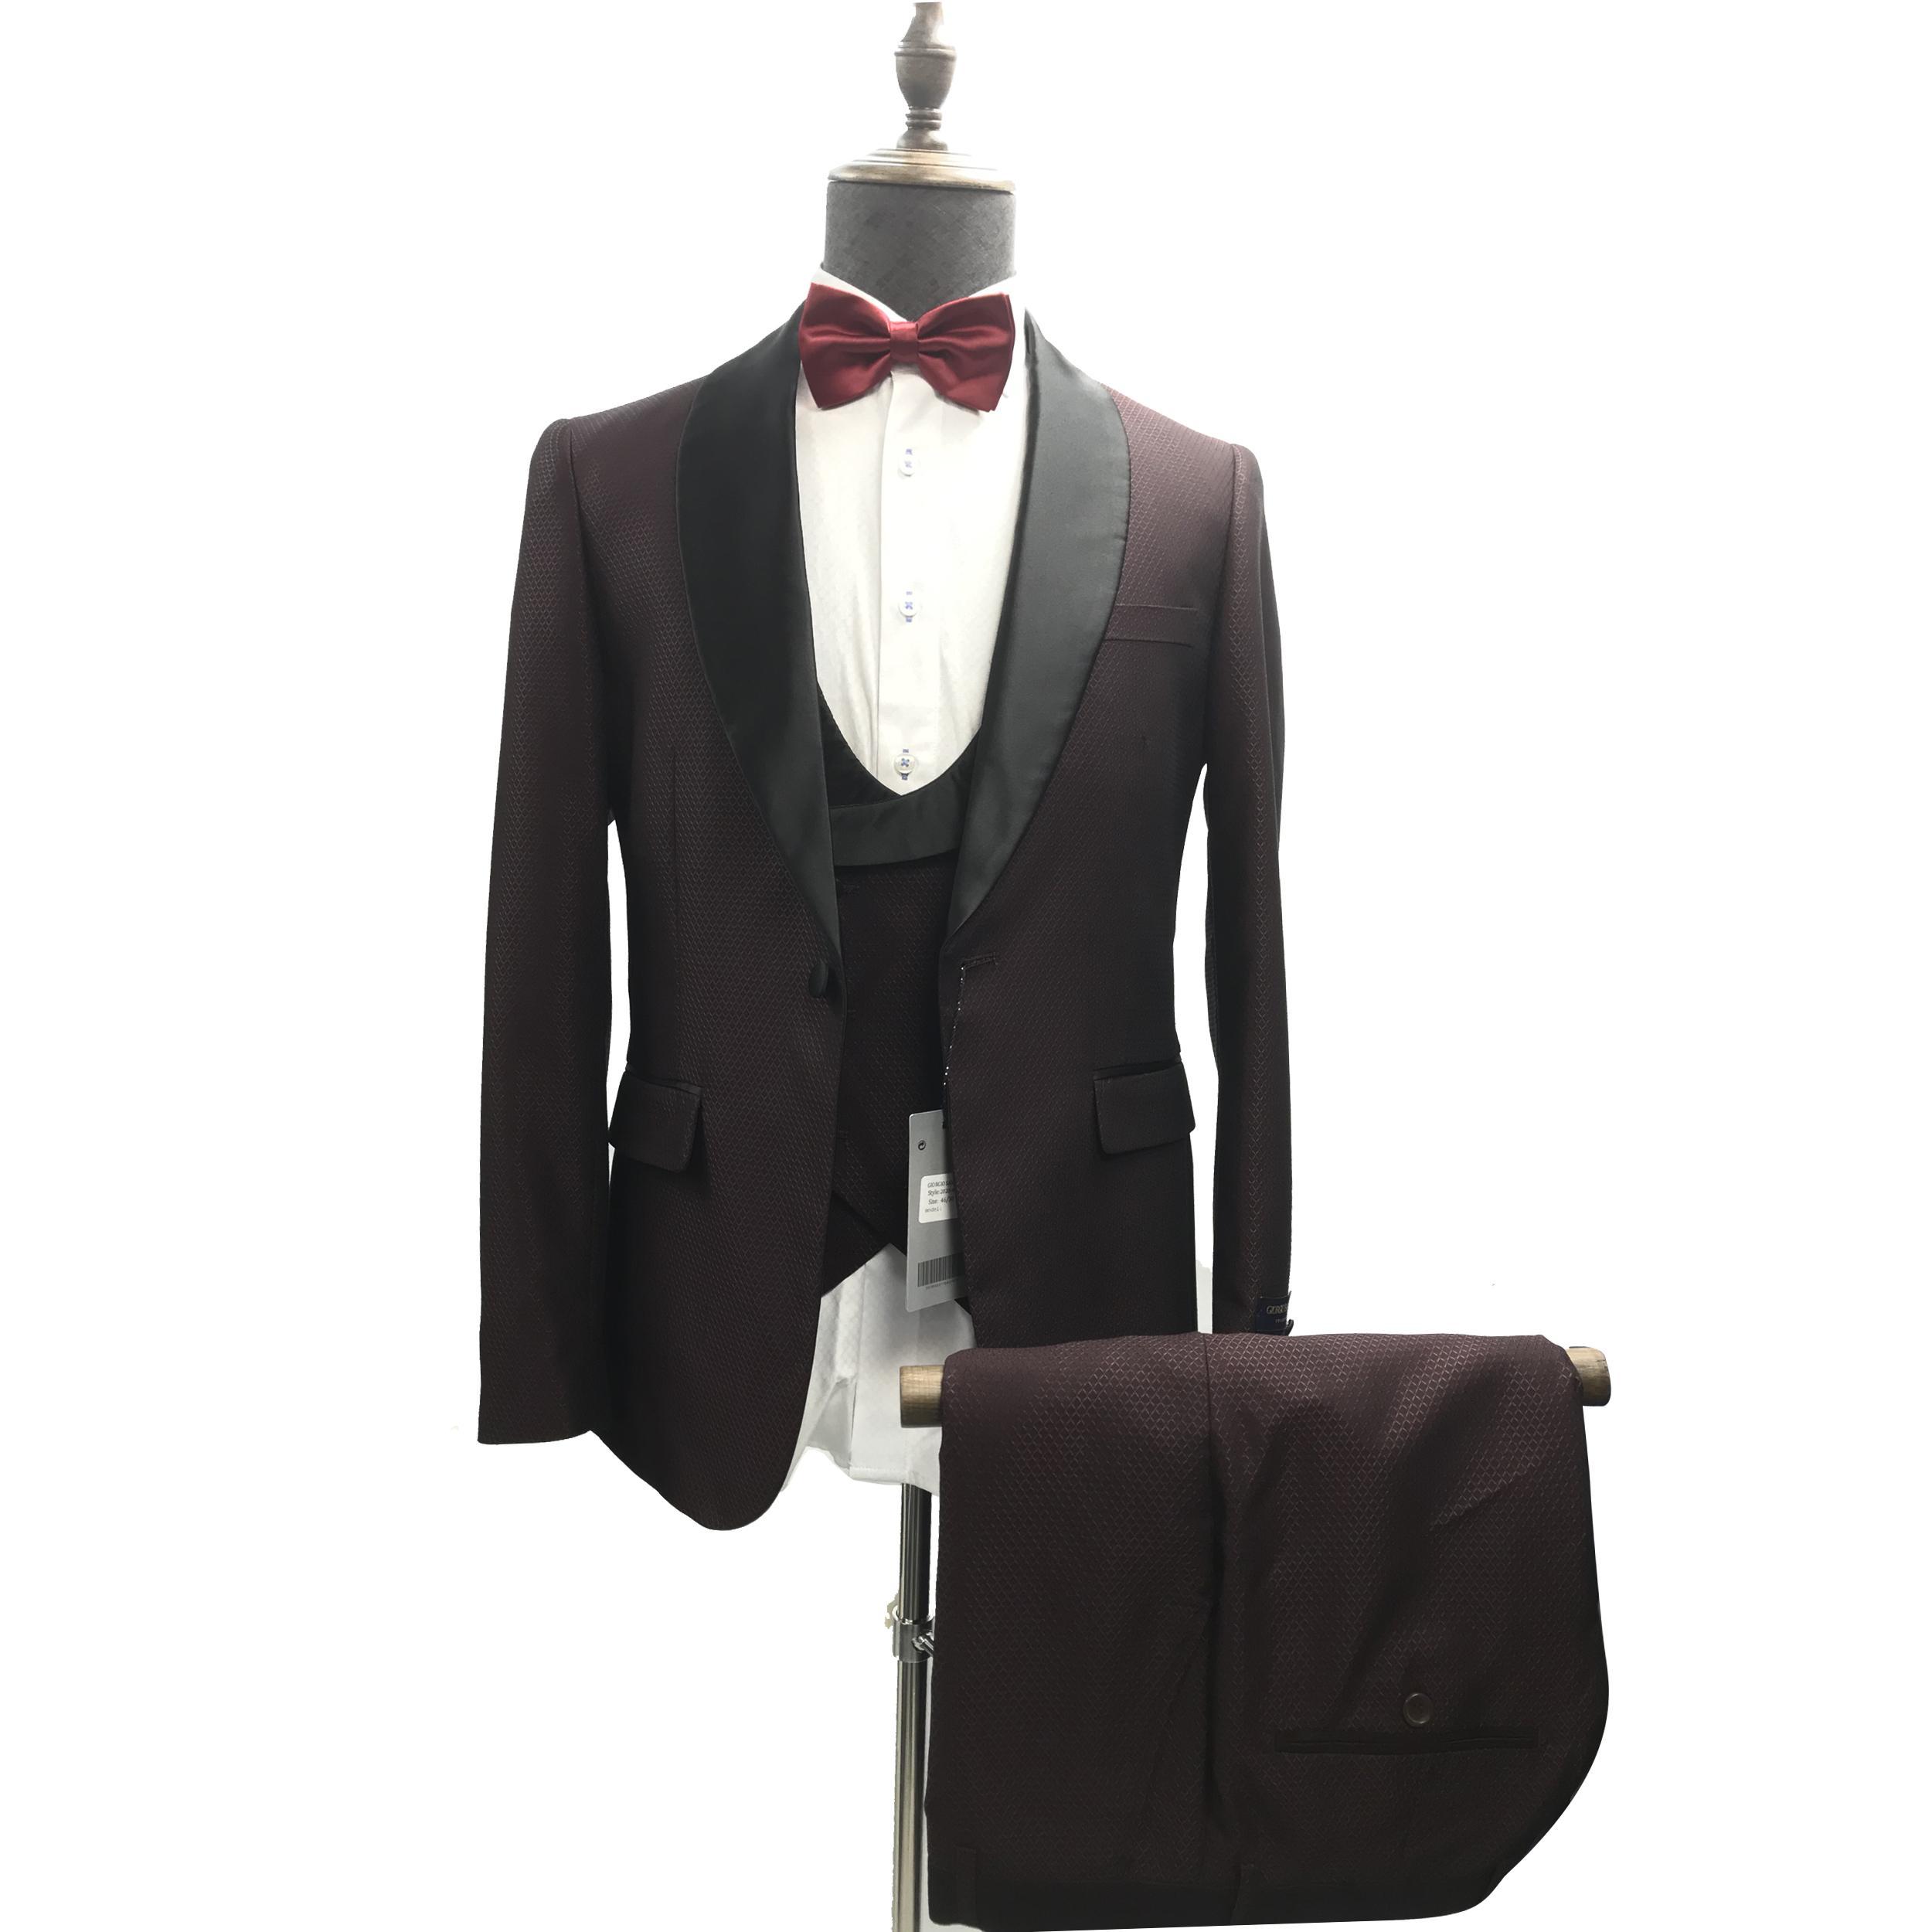 Giorgiosantini Mens Mariage 2019 Design italien Custom Custom Fabrication Bleu Fumeurs Tuxedo Veste 3 Pièce Groom Terno Converses pour hommes